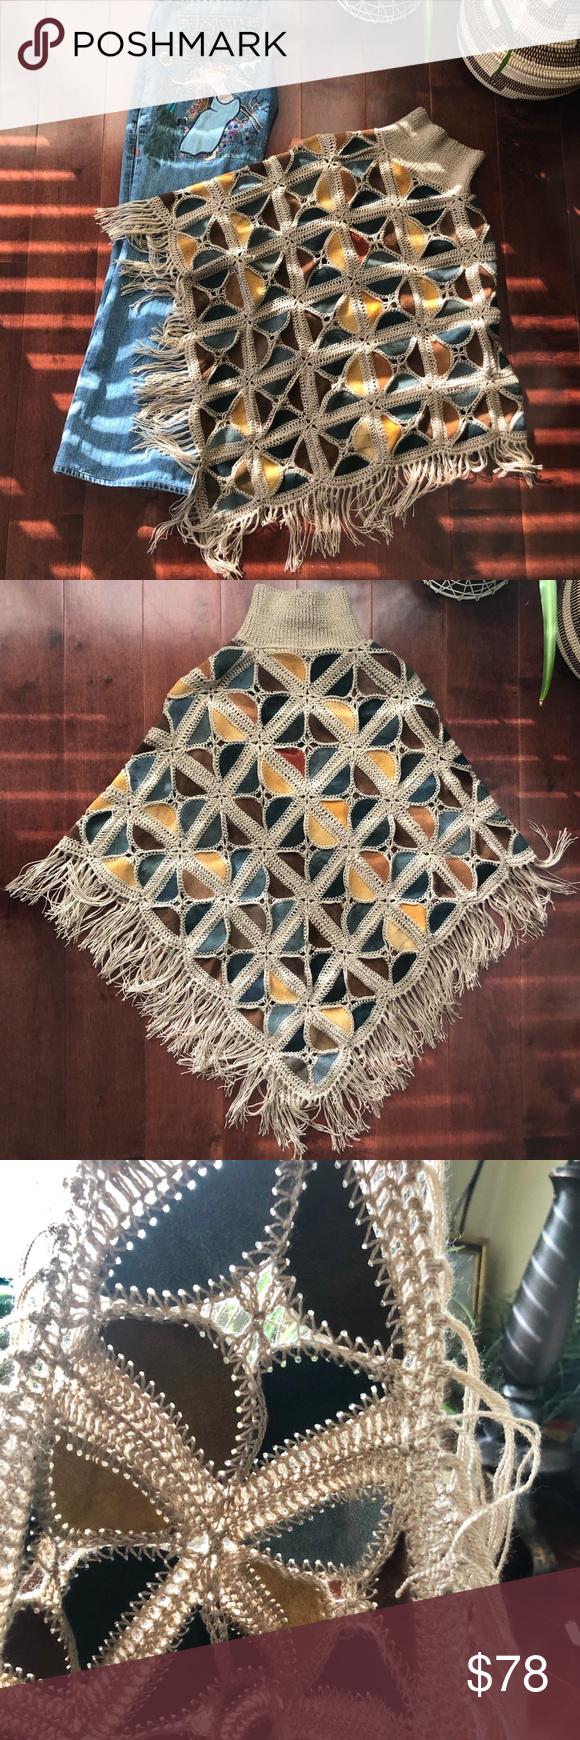 Photo of Vtg. Reversible, Faux Leather Knit Poncho Vintage- Faux leather Boho knit, rever…